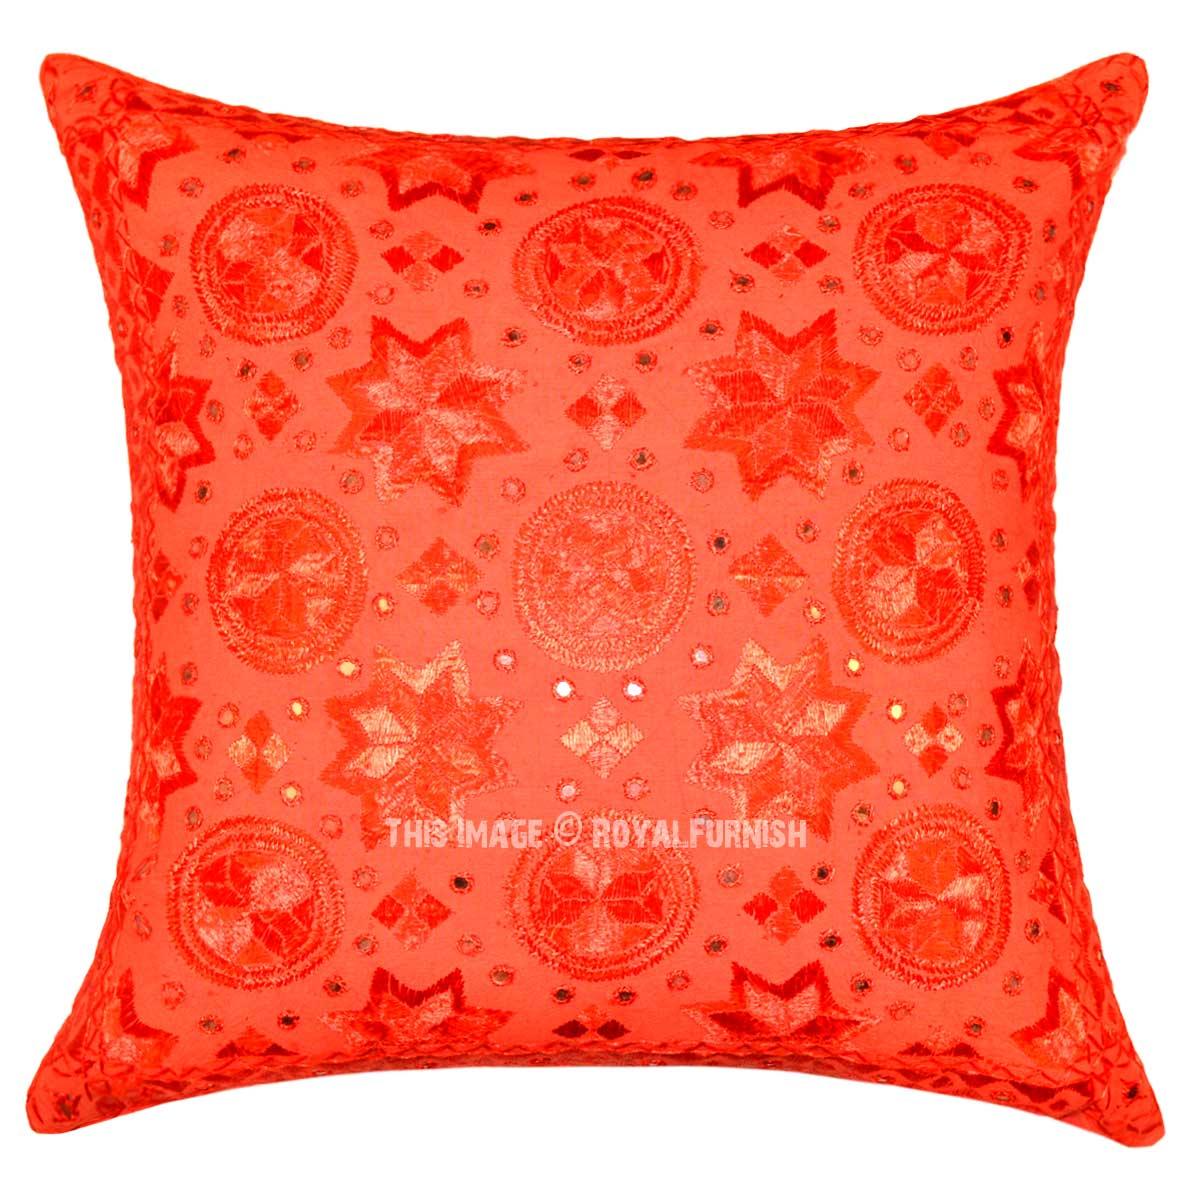 24x24 Red Star Mirror Unique Embroidery Work Art Cotton